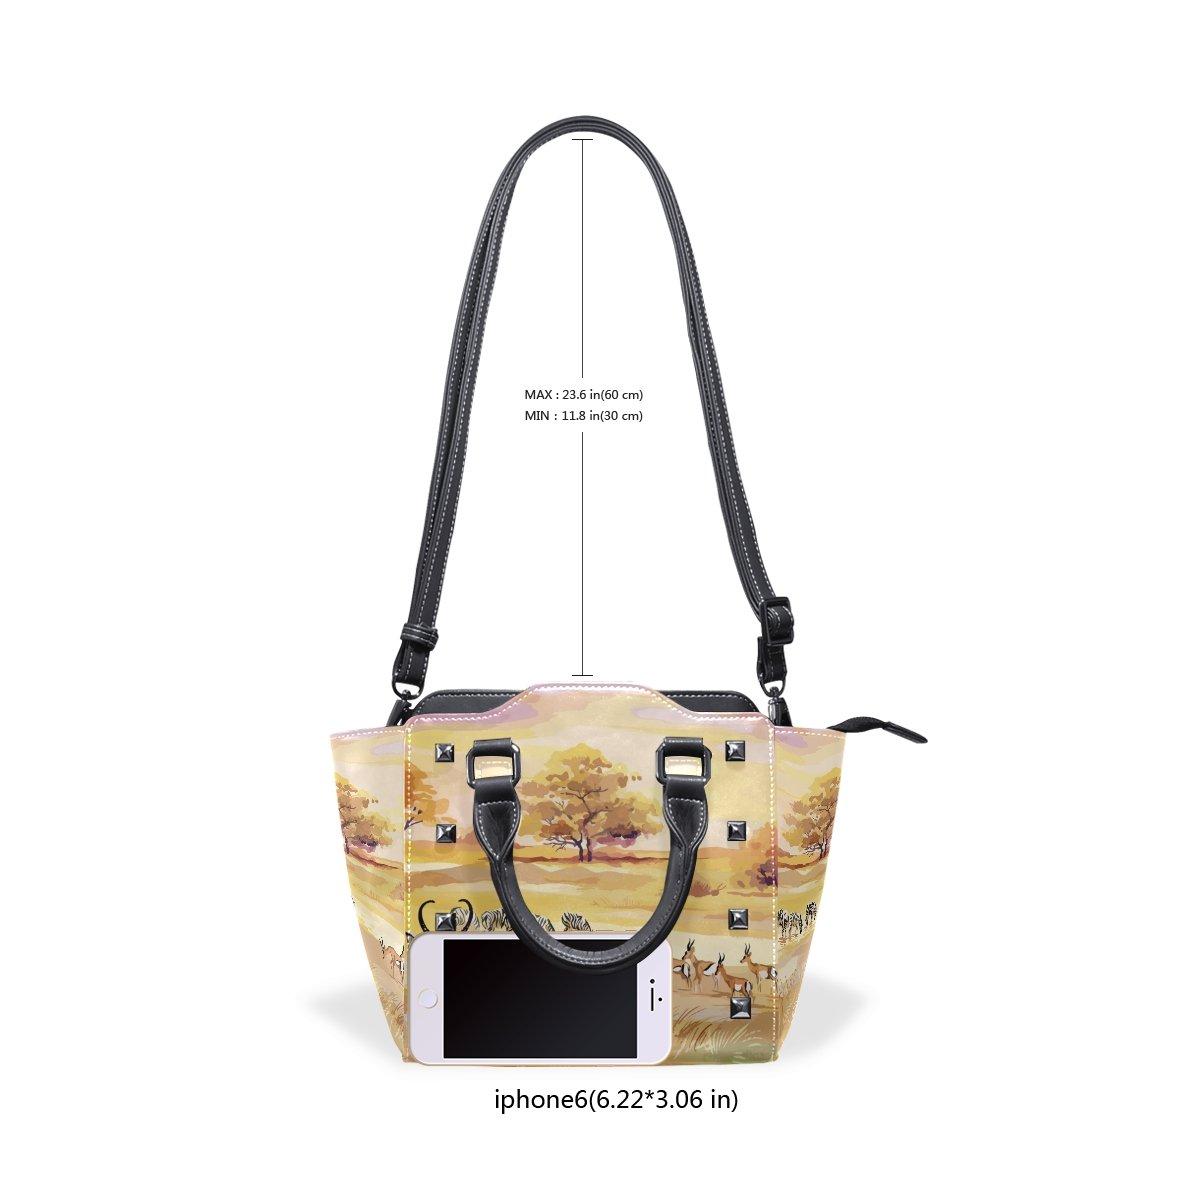 imobaby Antelope Zebra PU Leather Girls Top-Handle Handbags Single-Shoulder Ladies Tote Crossbody Bag Messenger Bags For Women